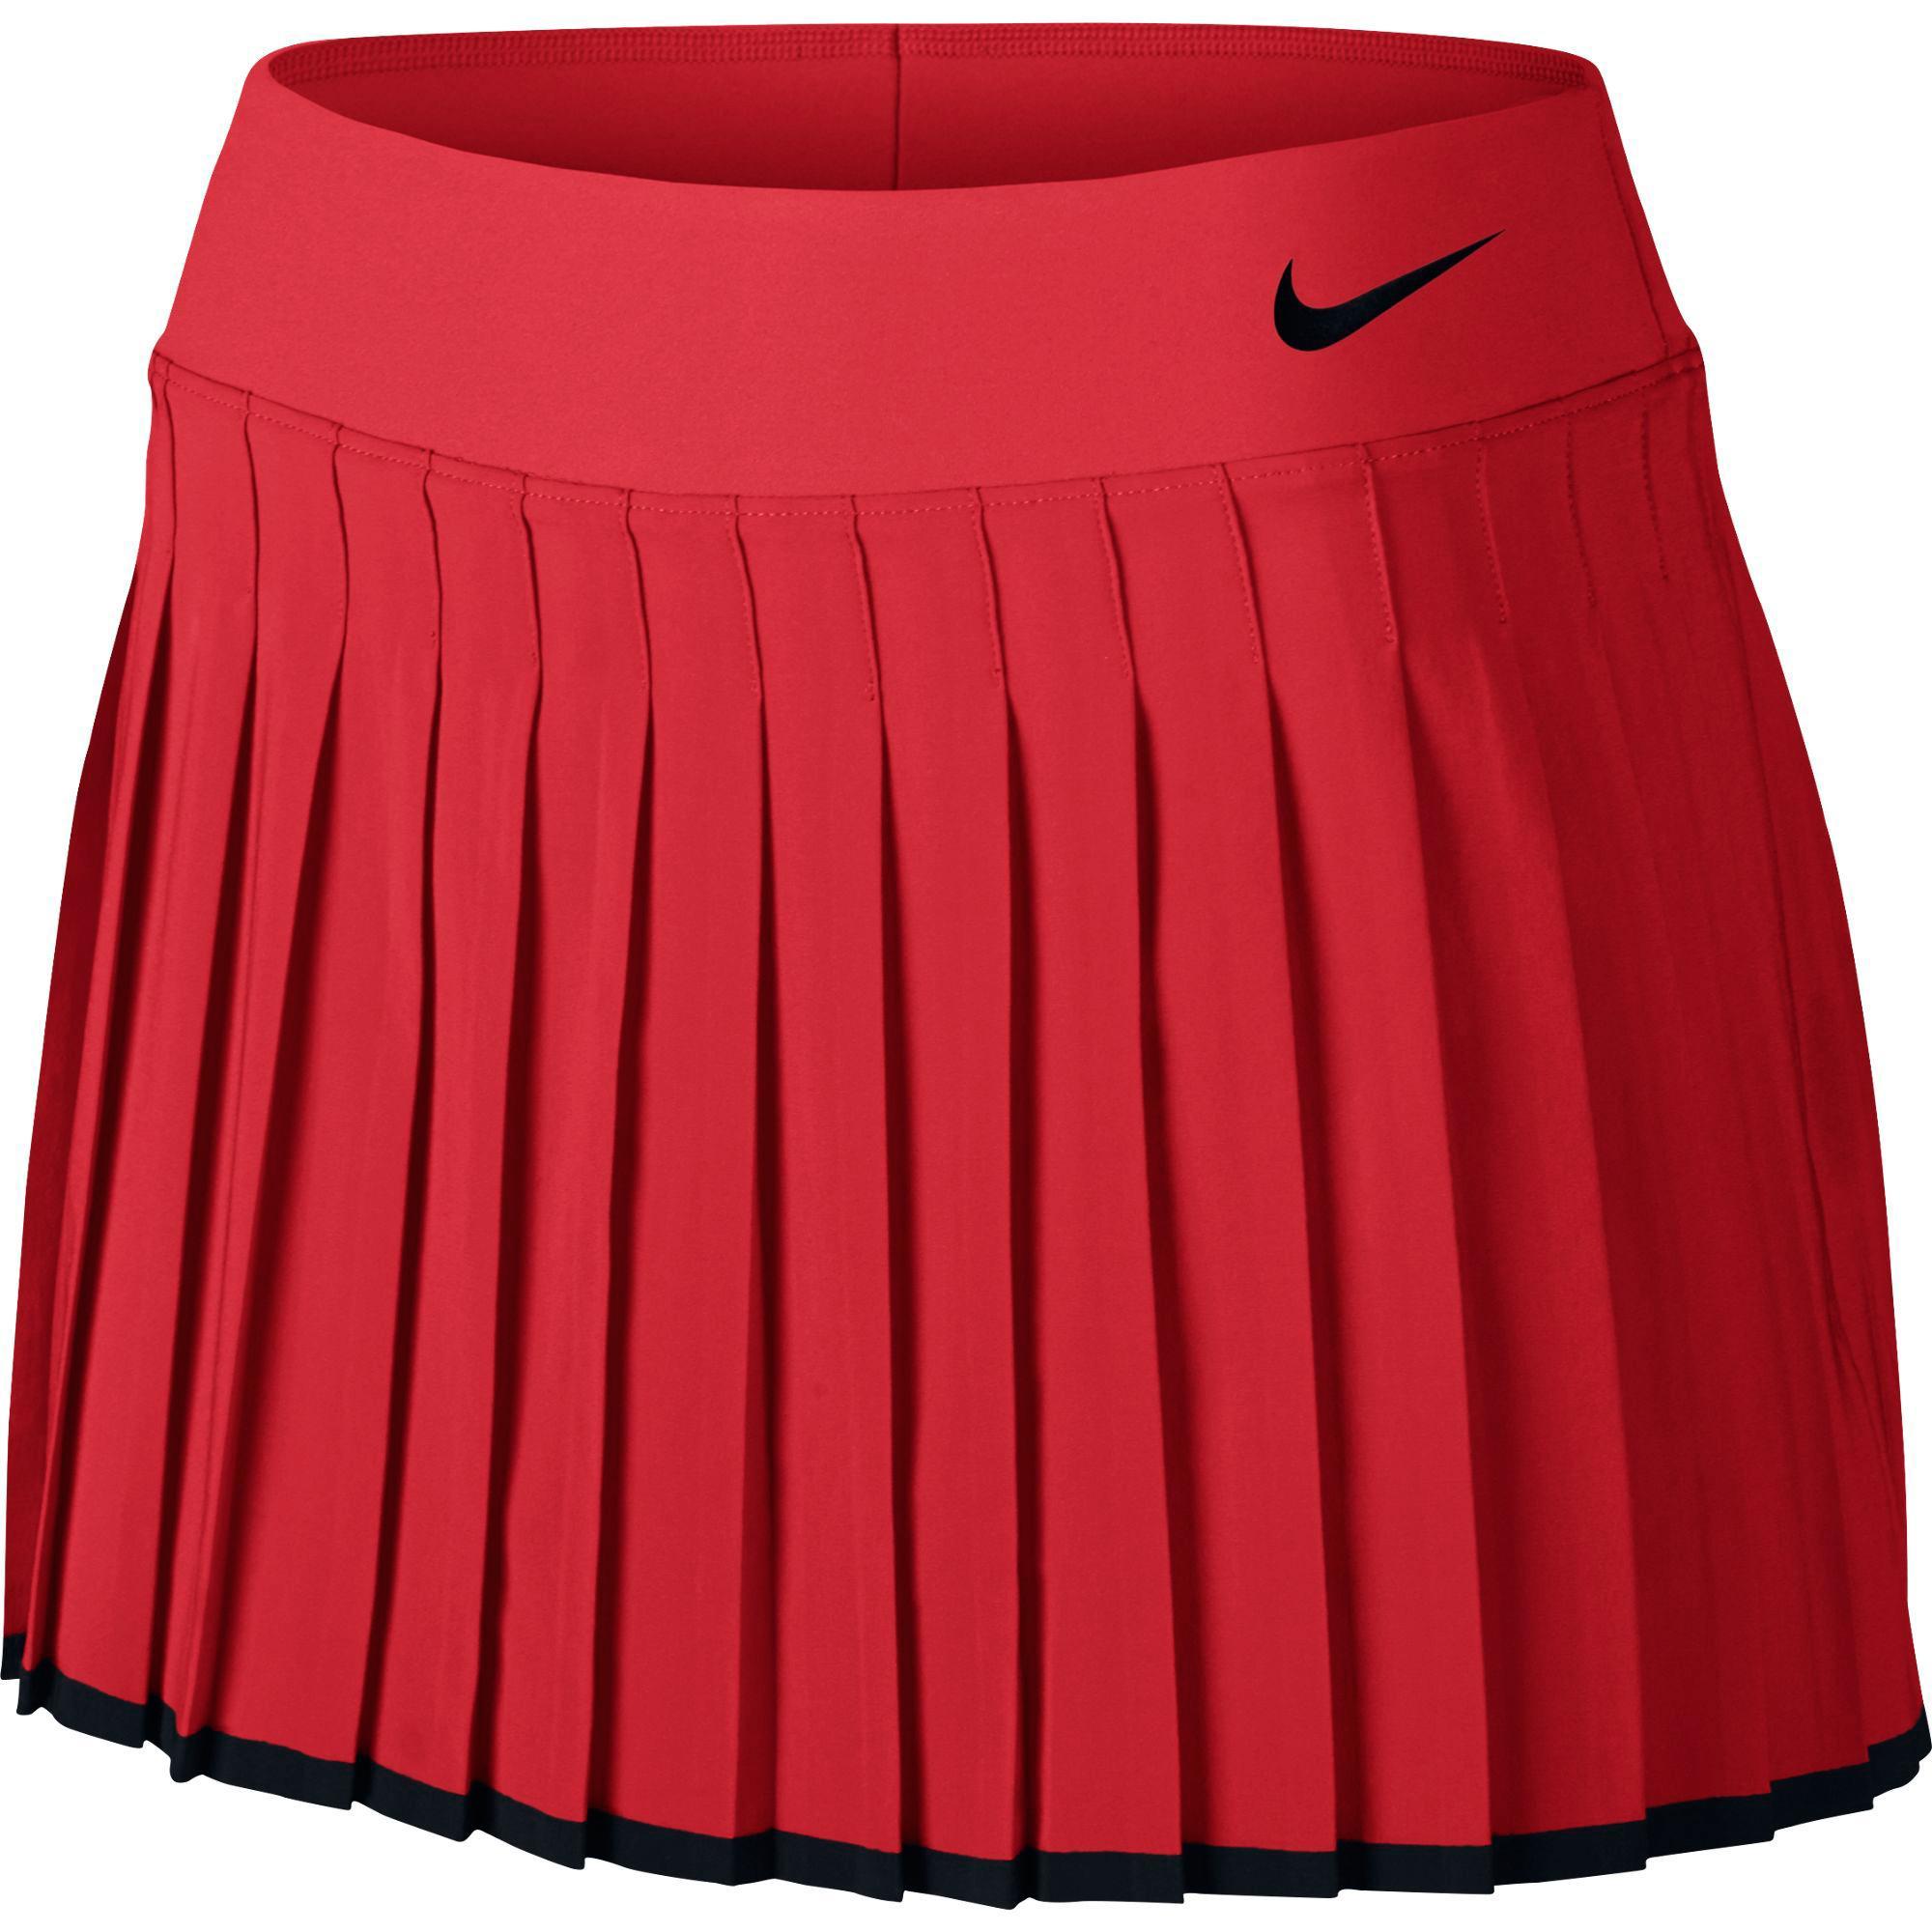 8b0ff77a0 Nike Womens Victory Tennis Skort - Action Red/Black - Tennisnuts.com